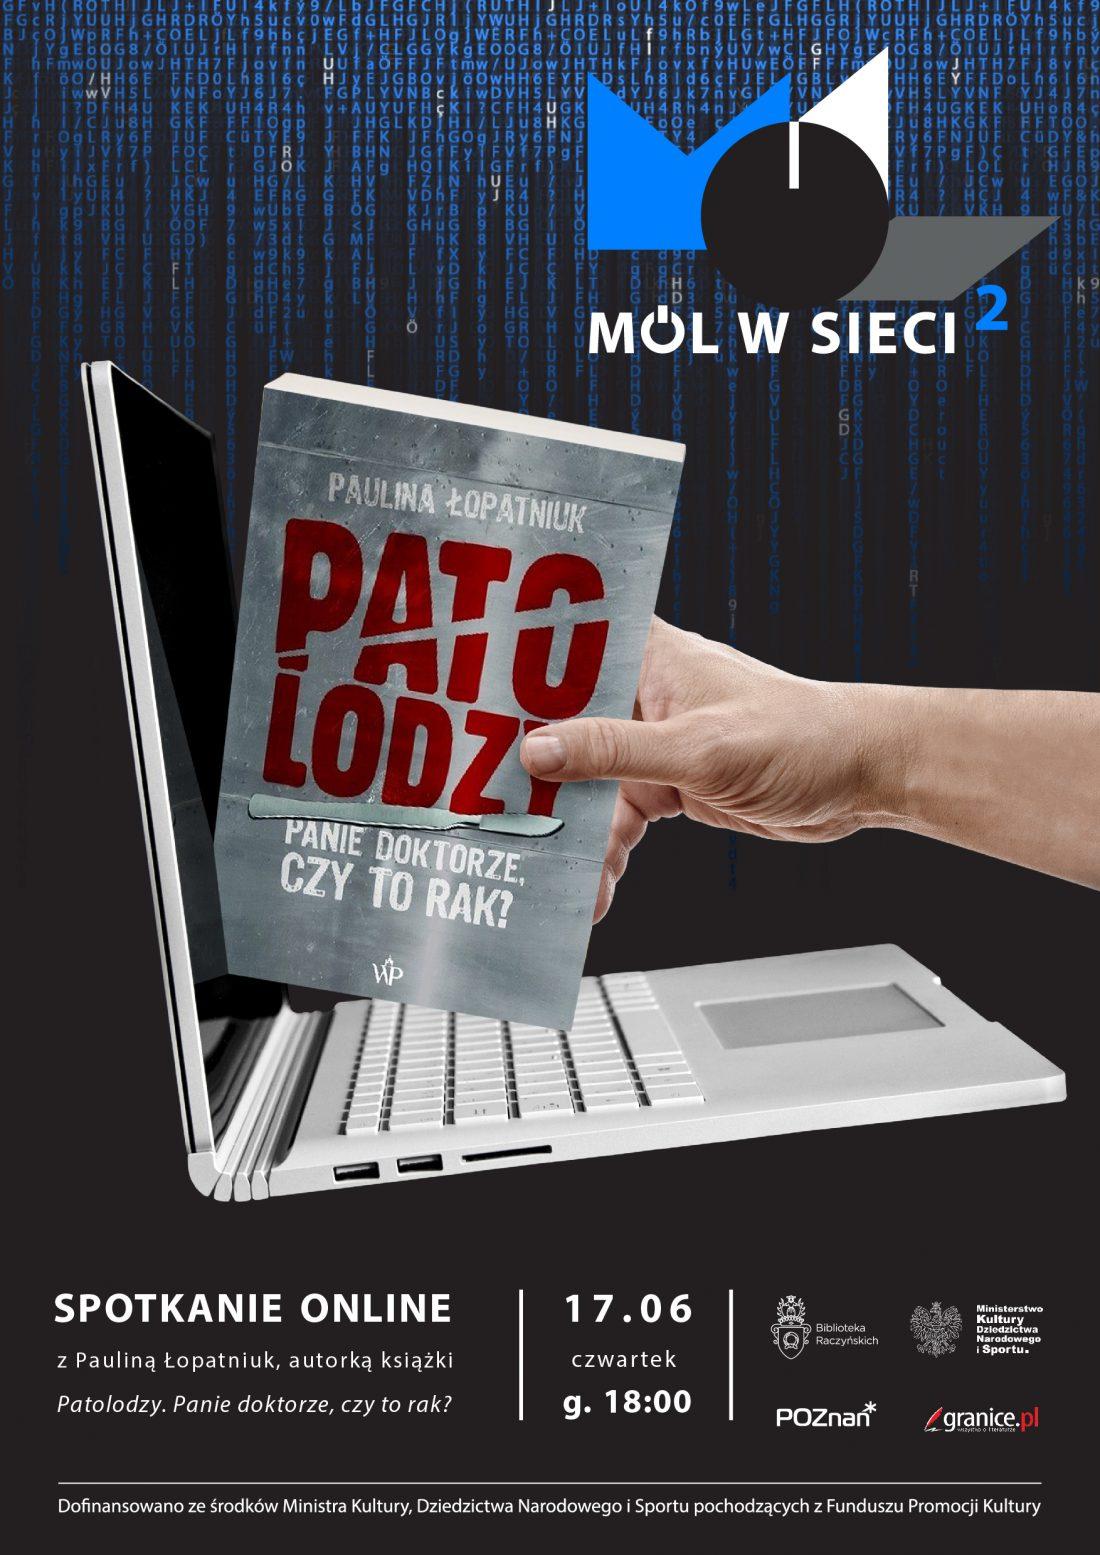 plakat spotkania z Pauliną Łopatniuk